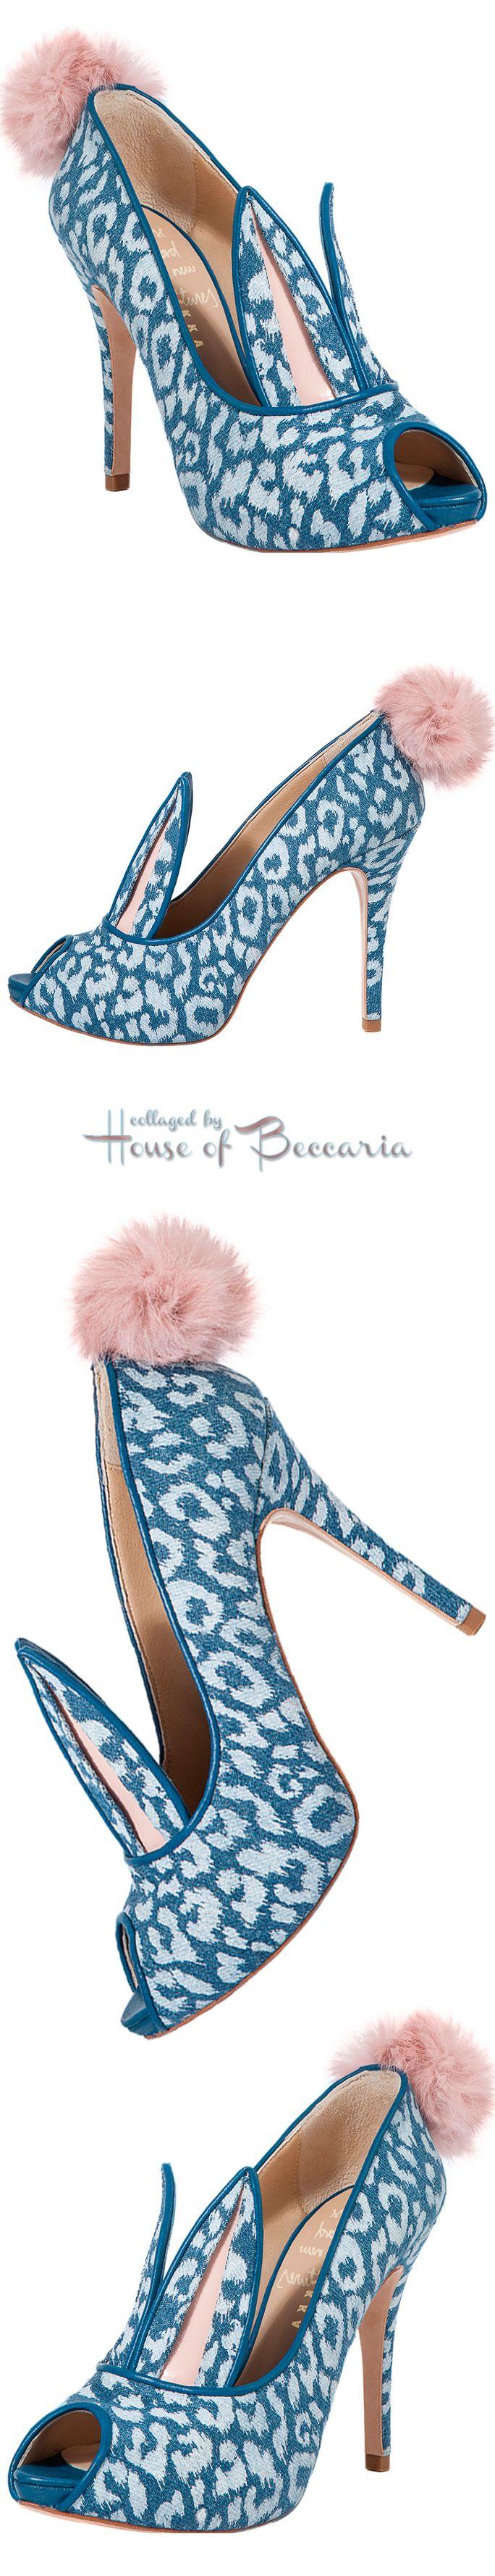 "~Minna Parikka ""Lolita"" Leopard & Denim bunny heels, Finland"